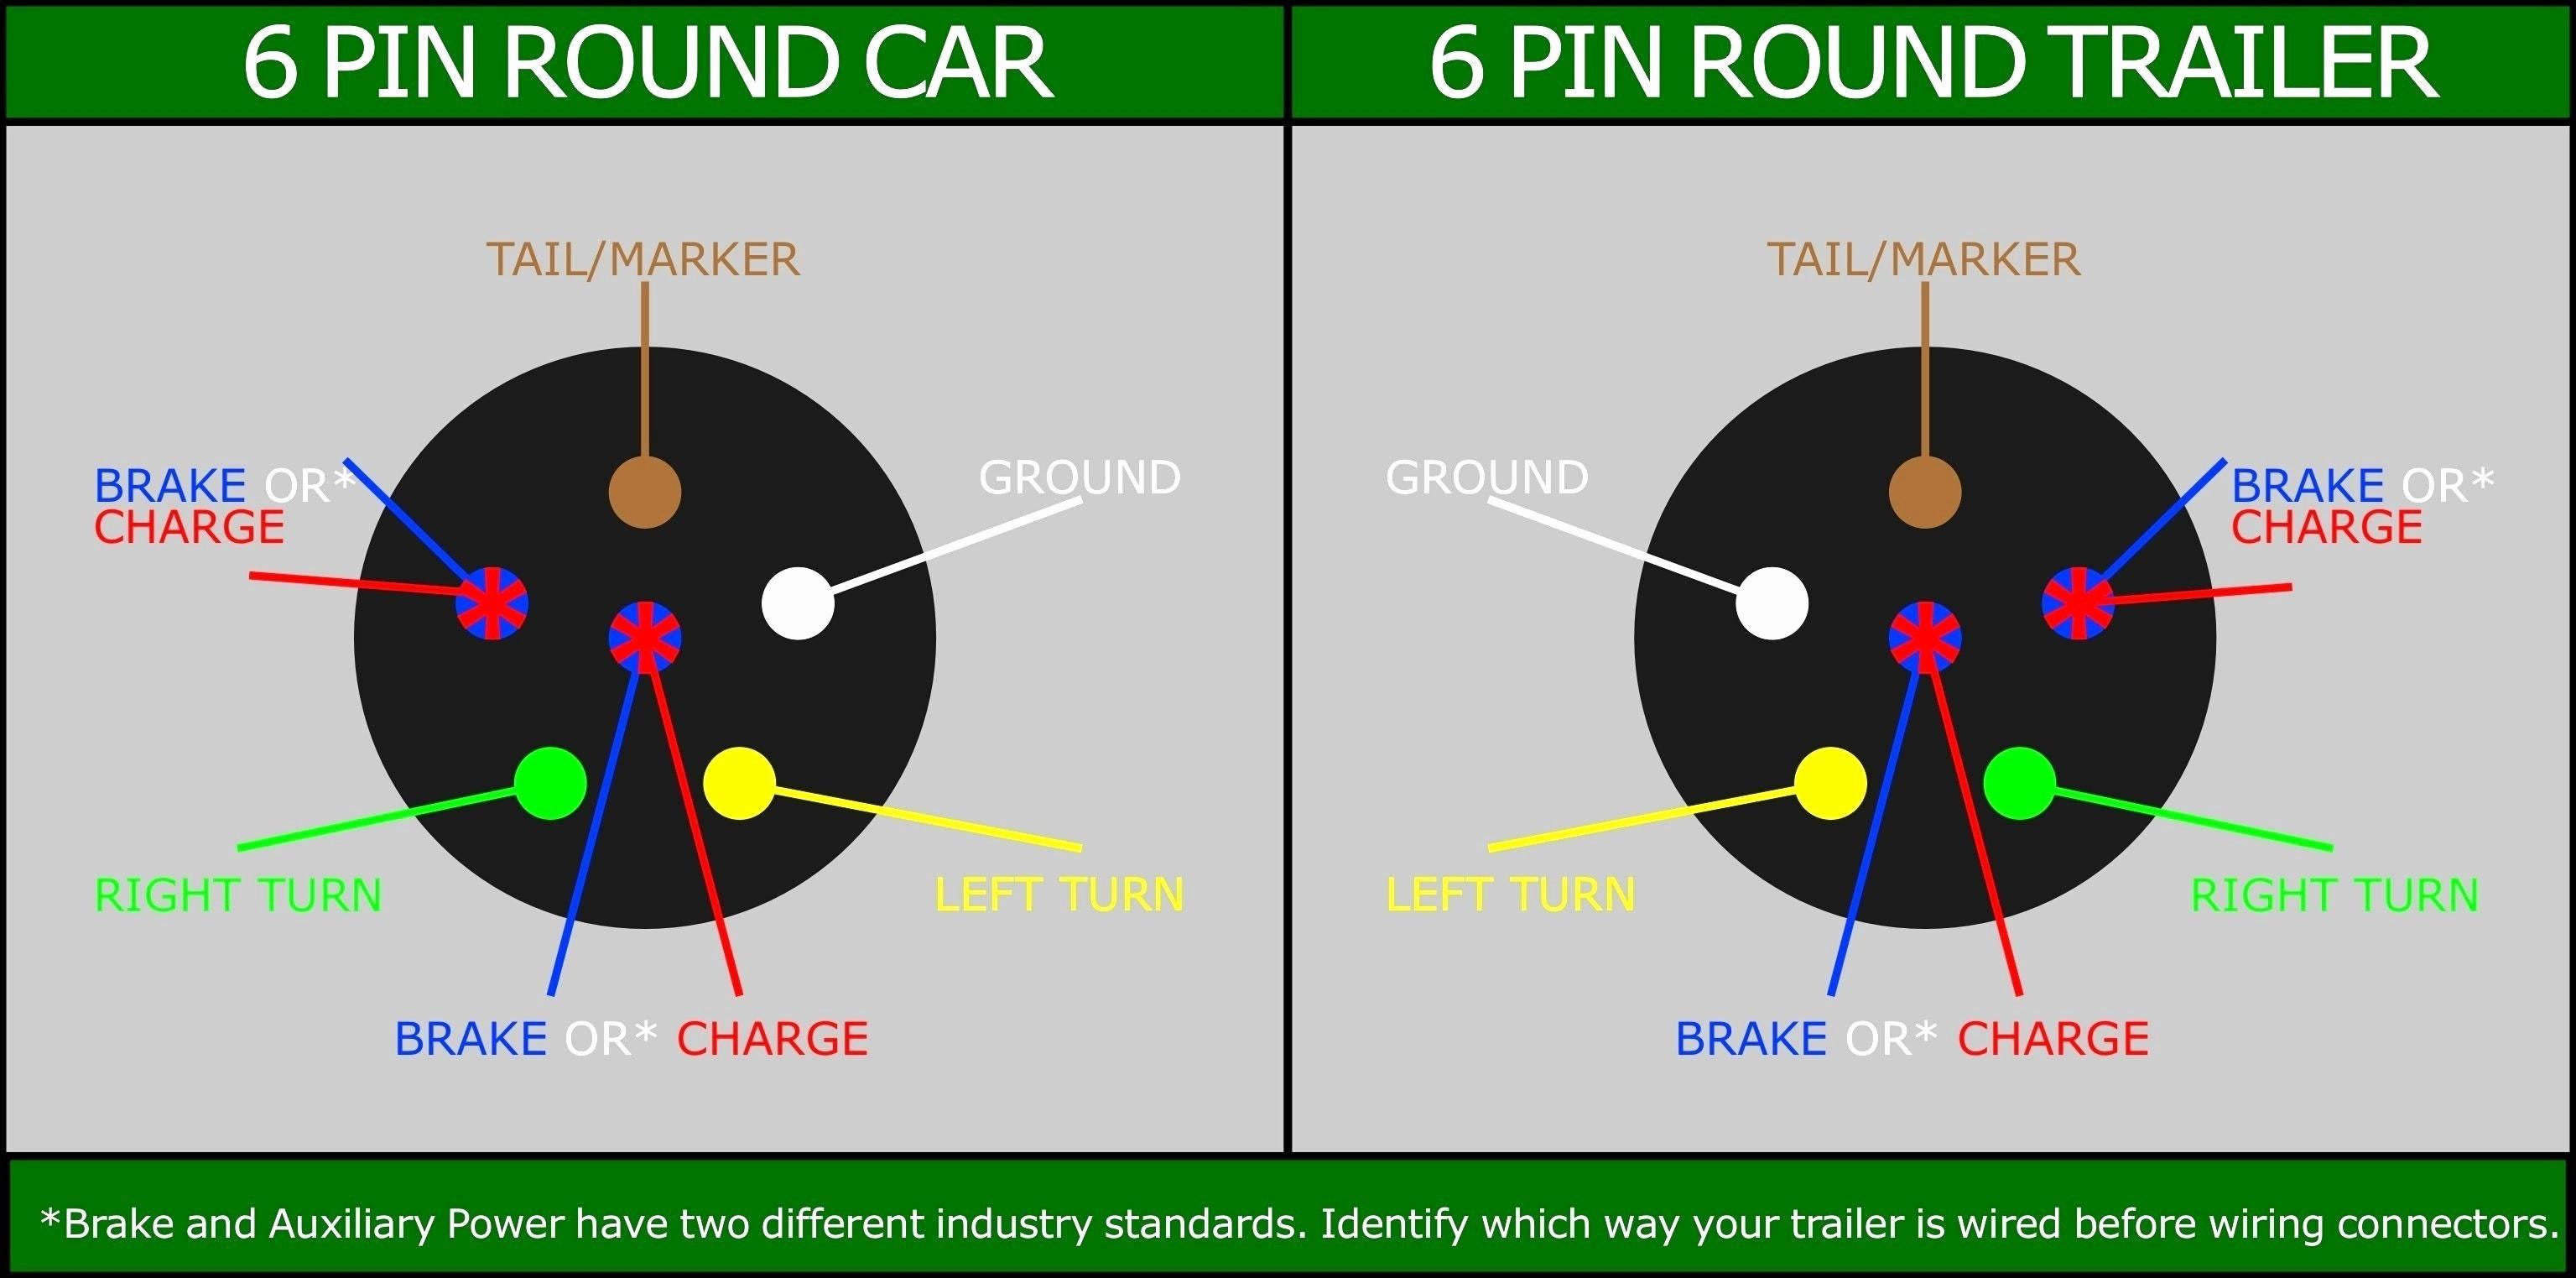 Volvo 7 Pin Round Trailer Plug Wiring Diagram | Wiring Diagram - Trailer Wiring Diagram 7 Pin Round